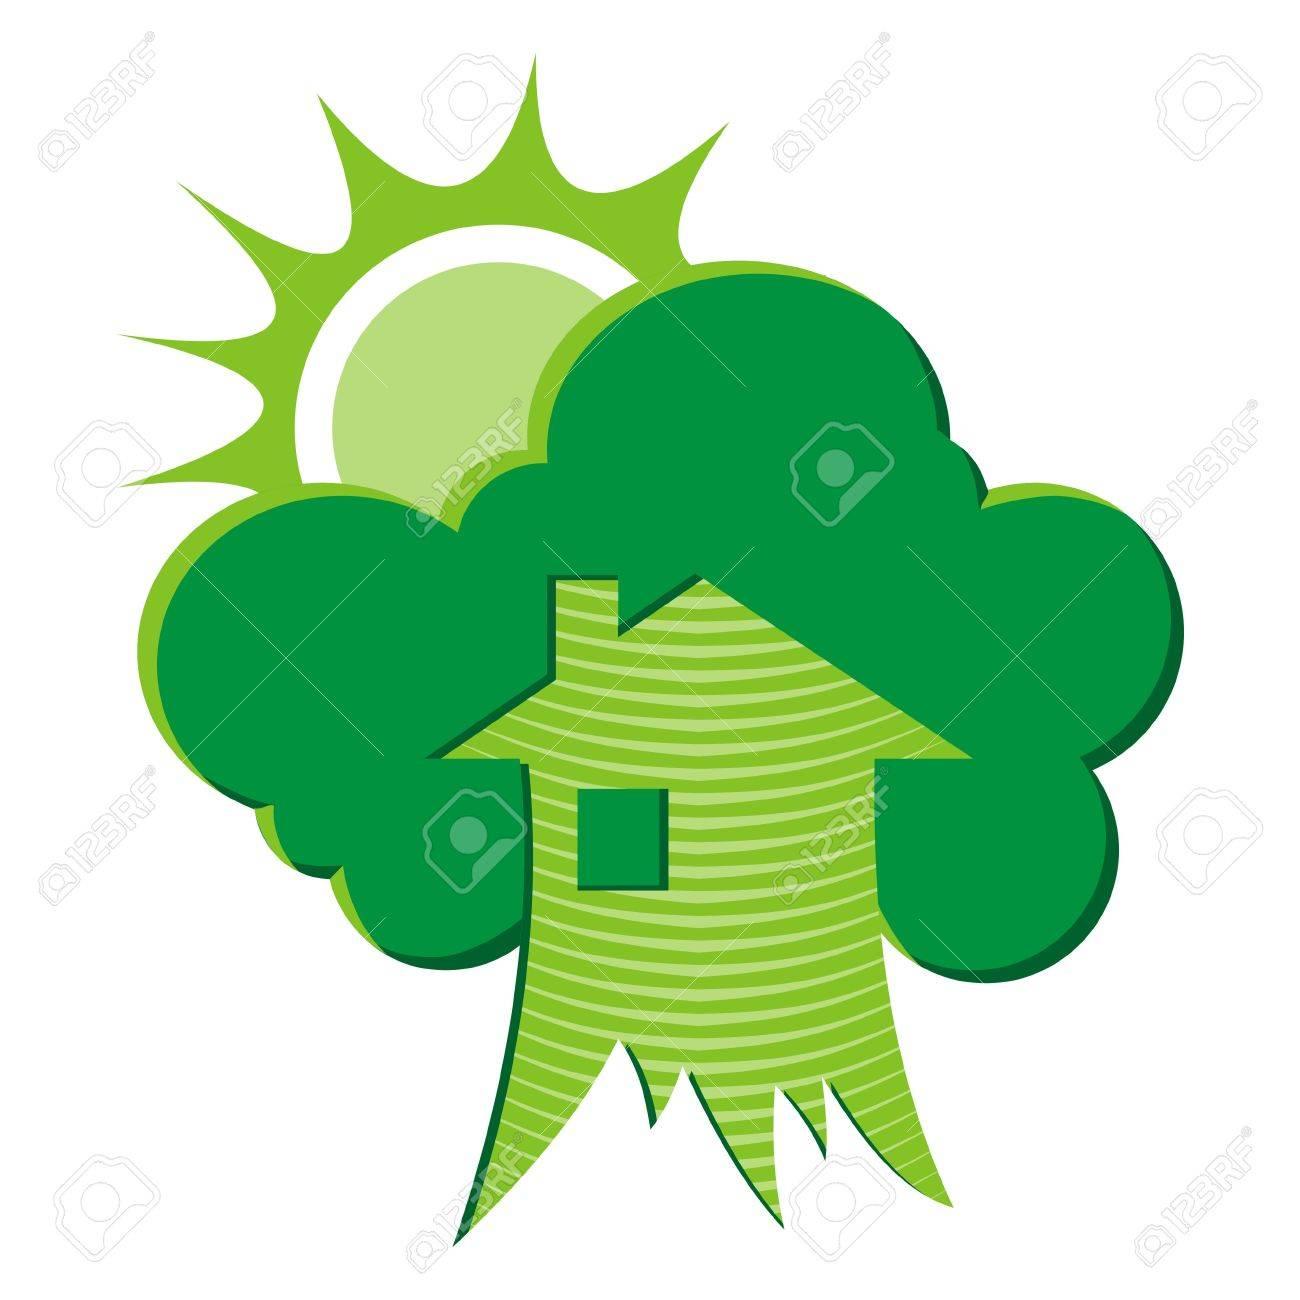 Green house environmental symbol - 2626797